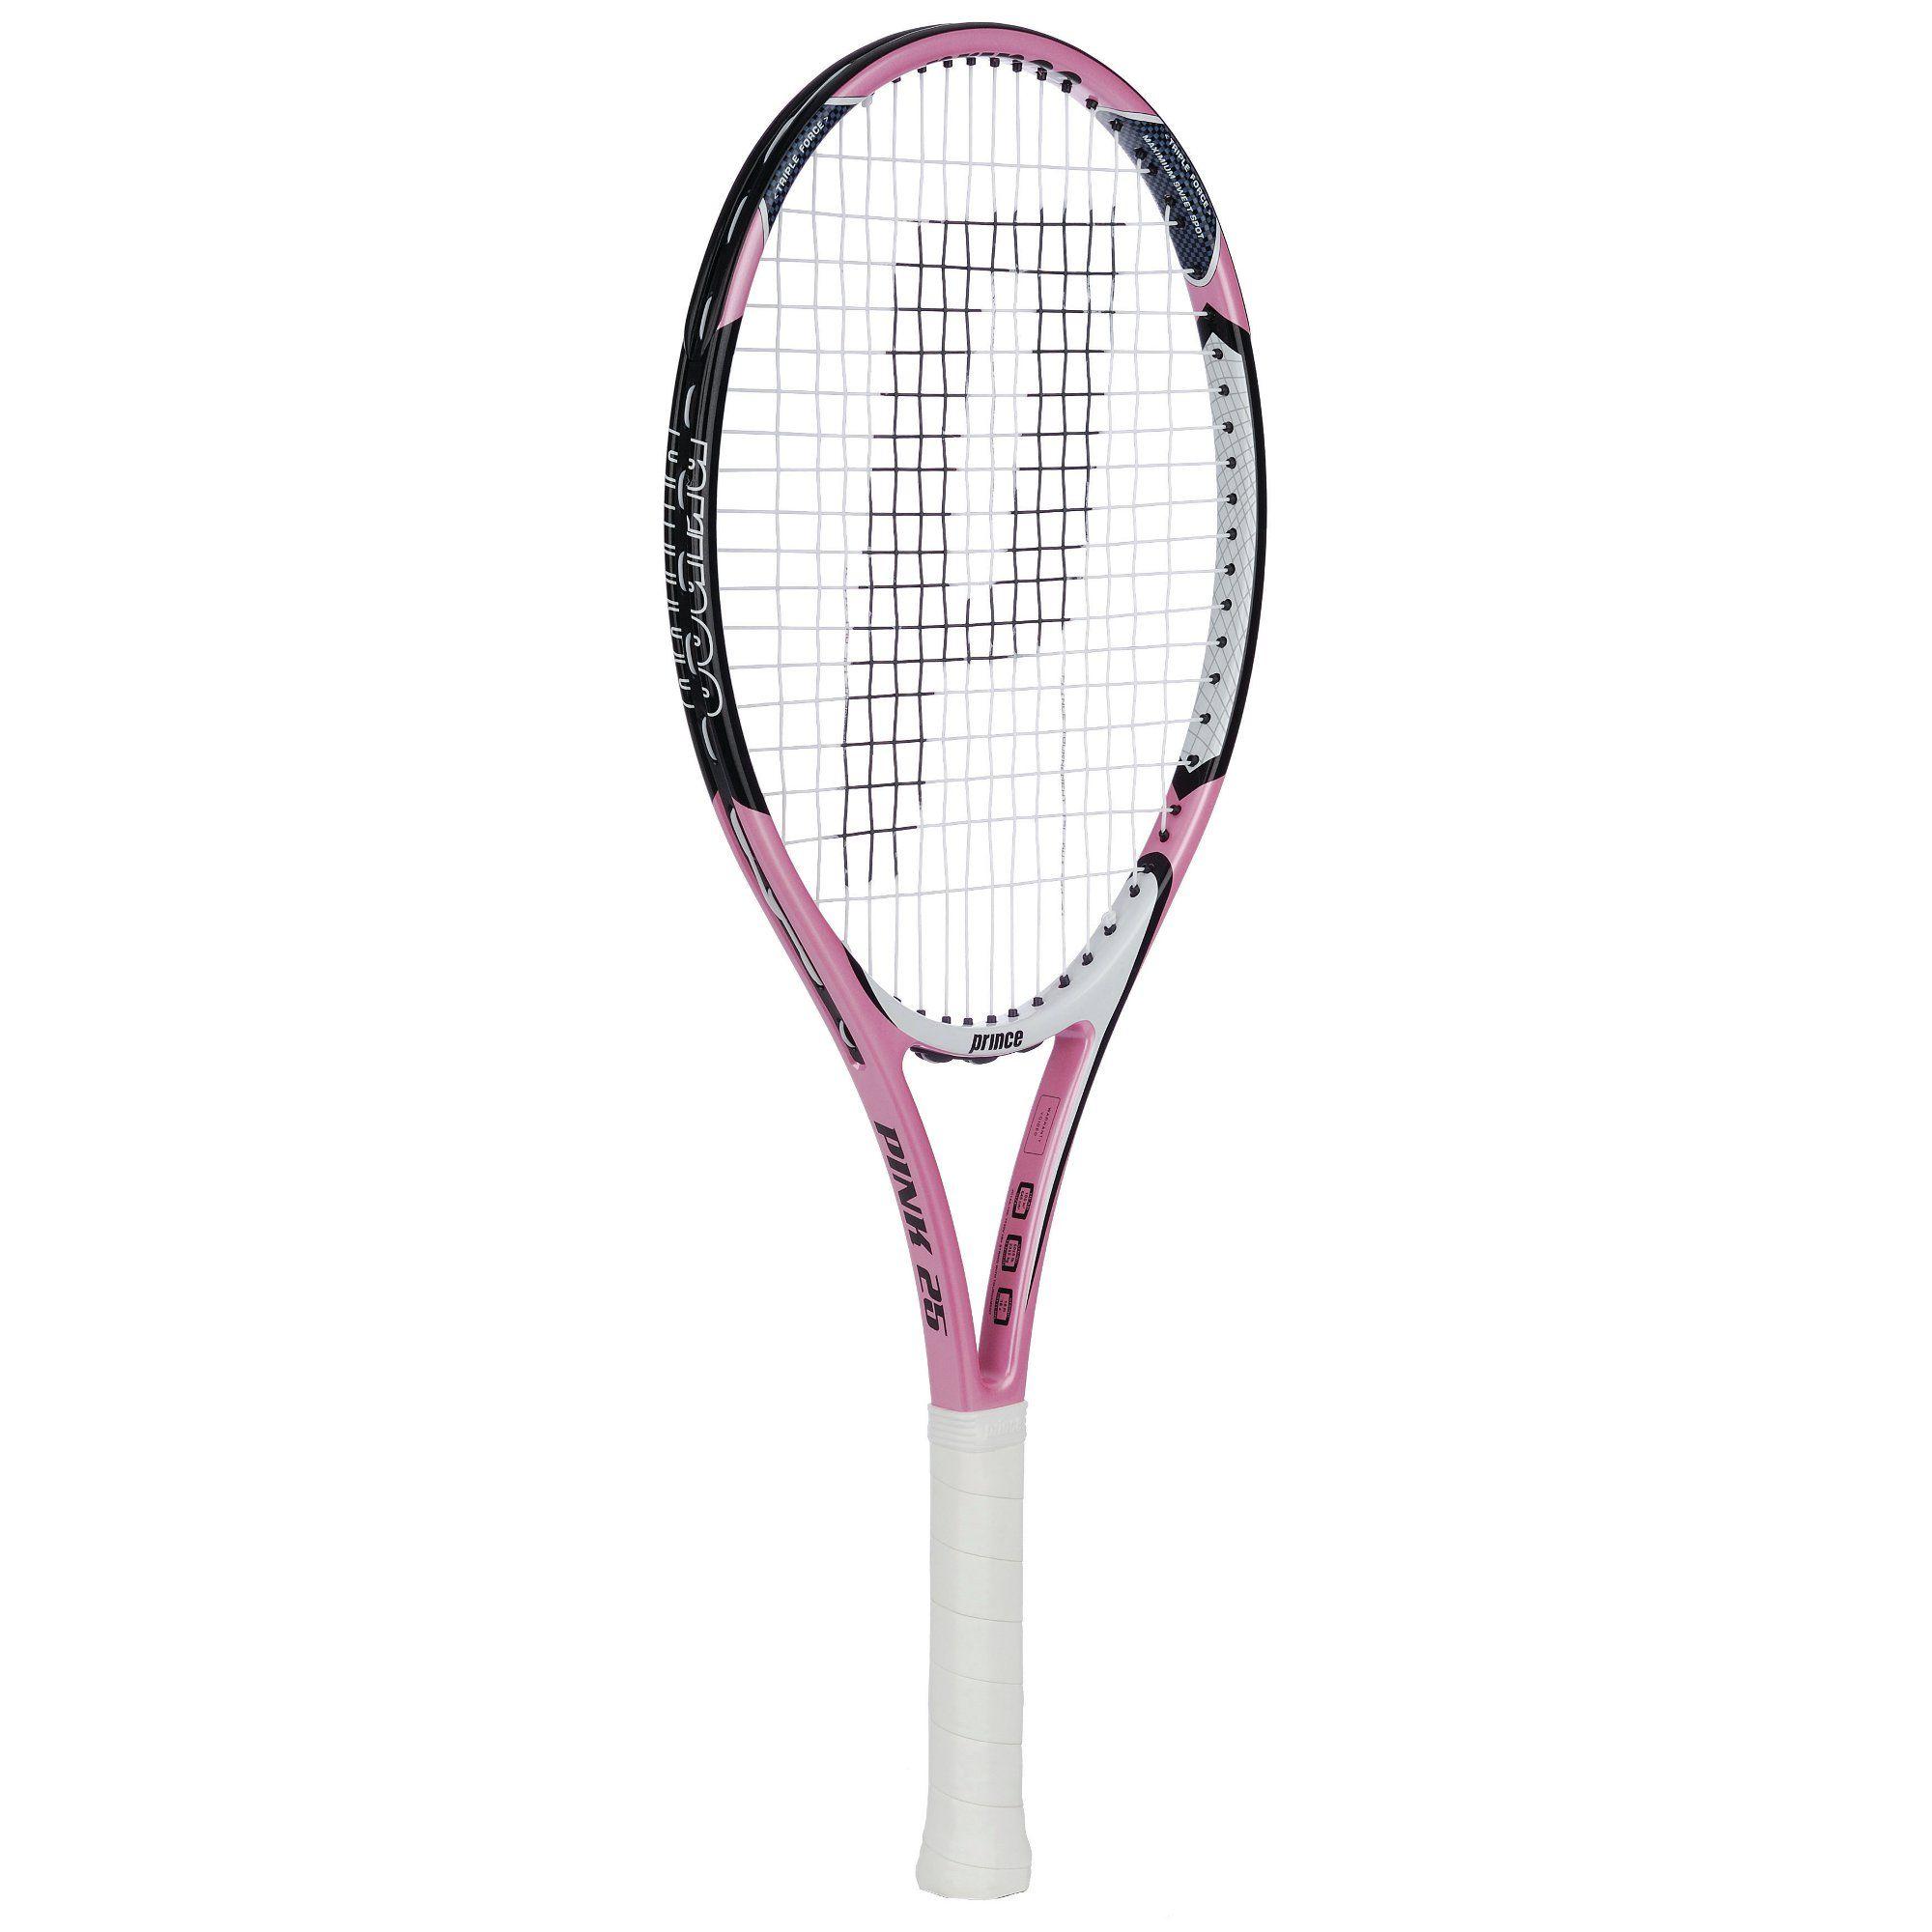 Prince Pink 25 Junior Tennis Racket - Sweatband.com